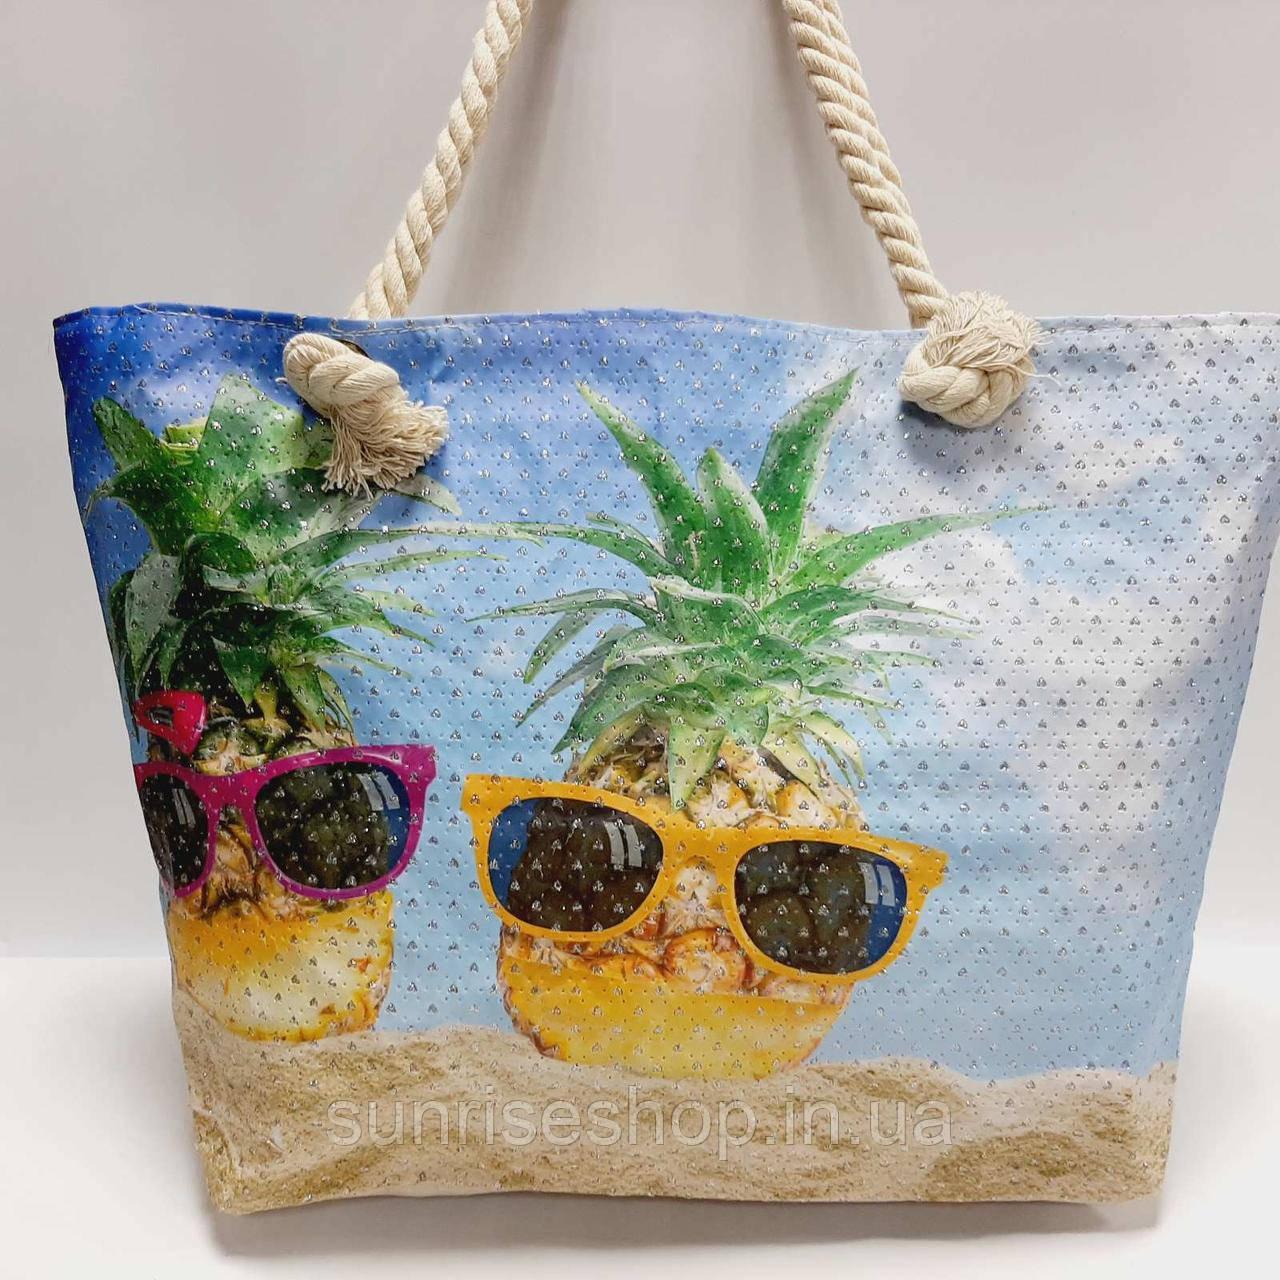 Сумка пляжная текстильная летняя